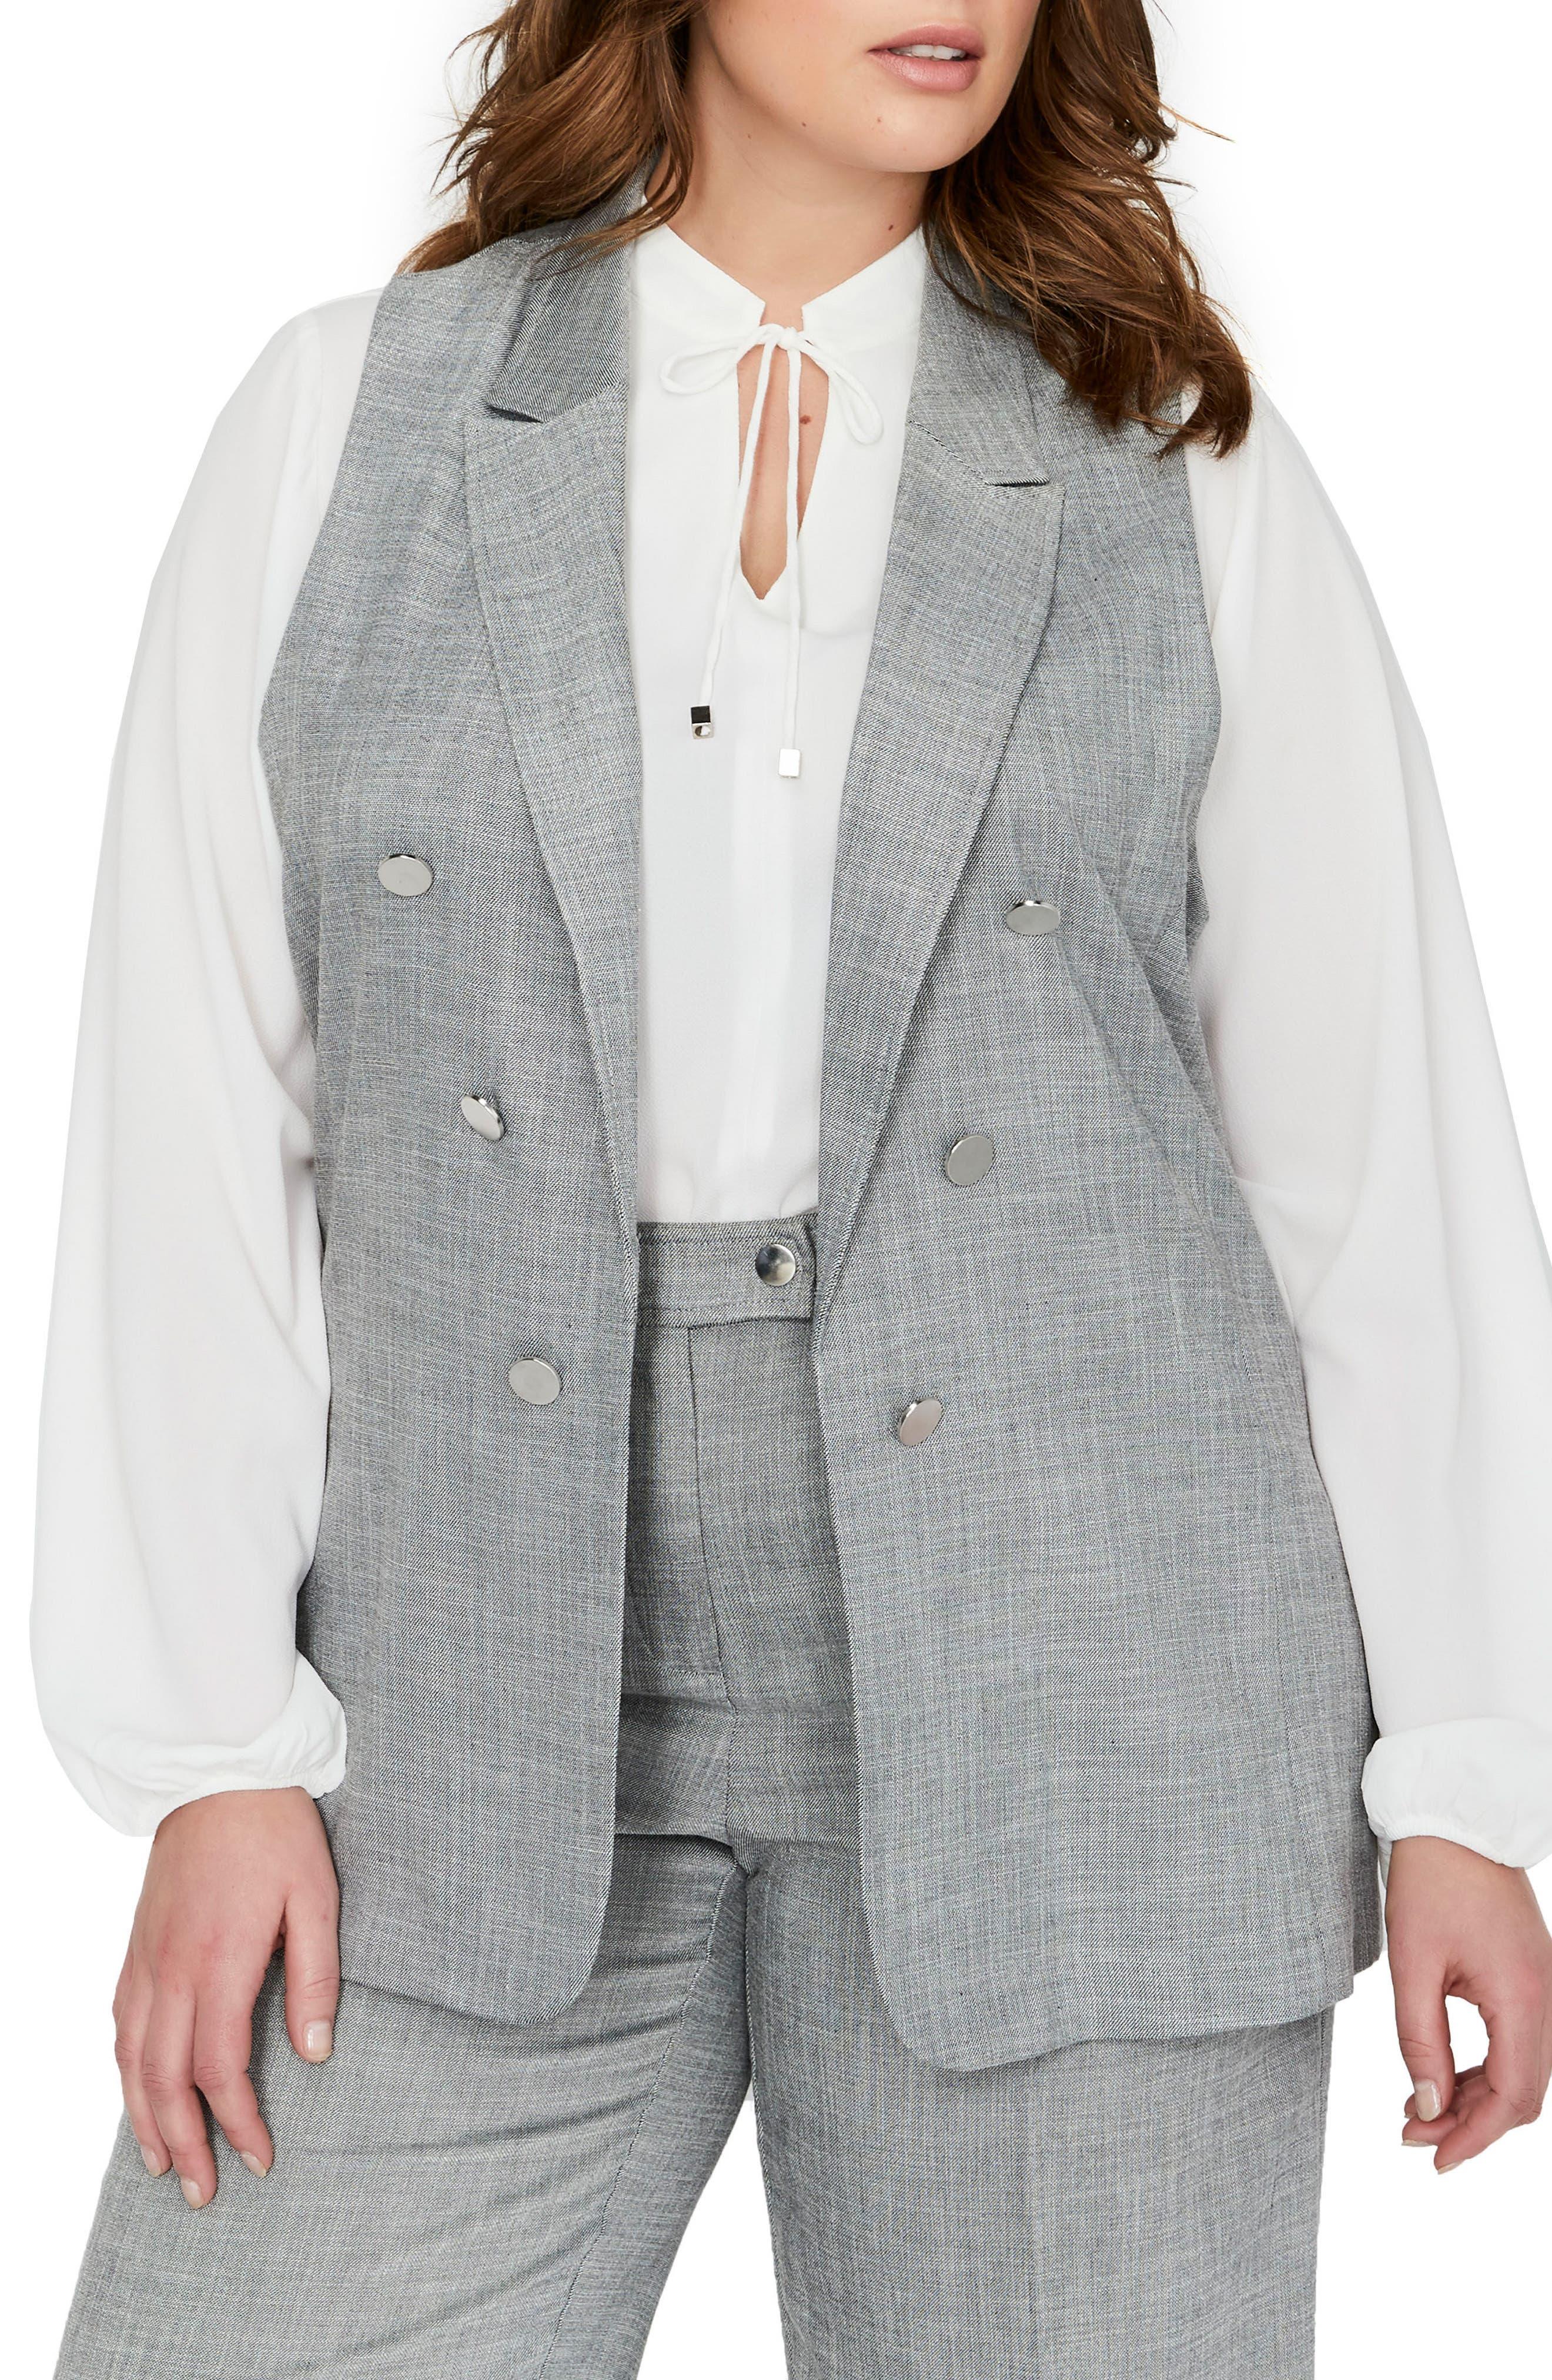 Peak Collar Vest,                         Main,                         color, Black/ White Yarn Dye- Sw